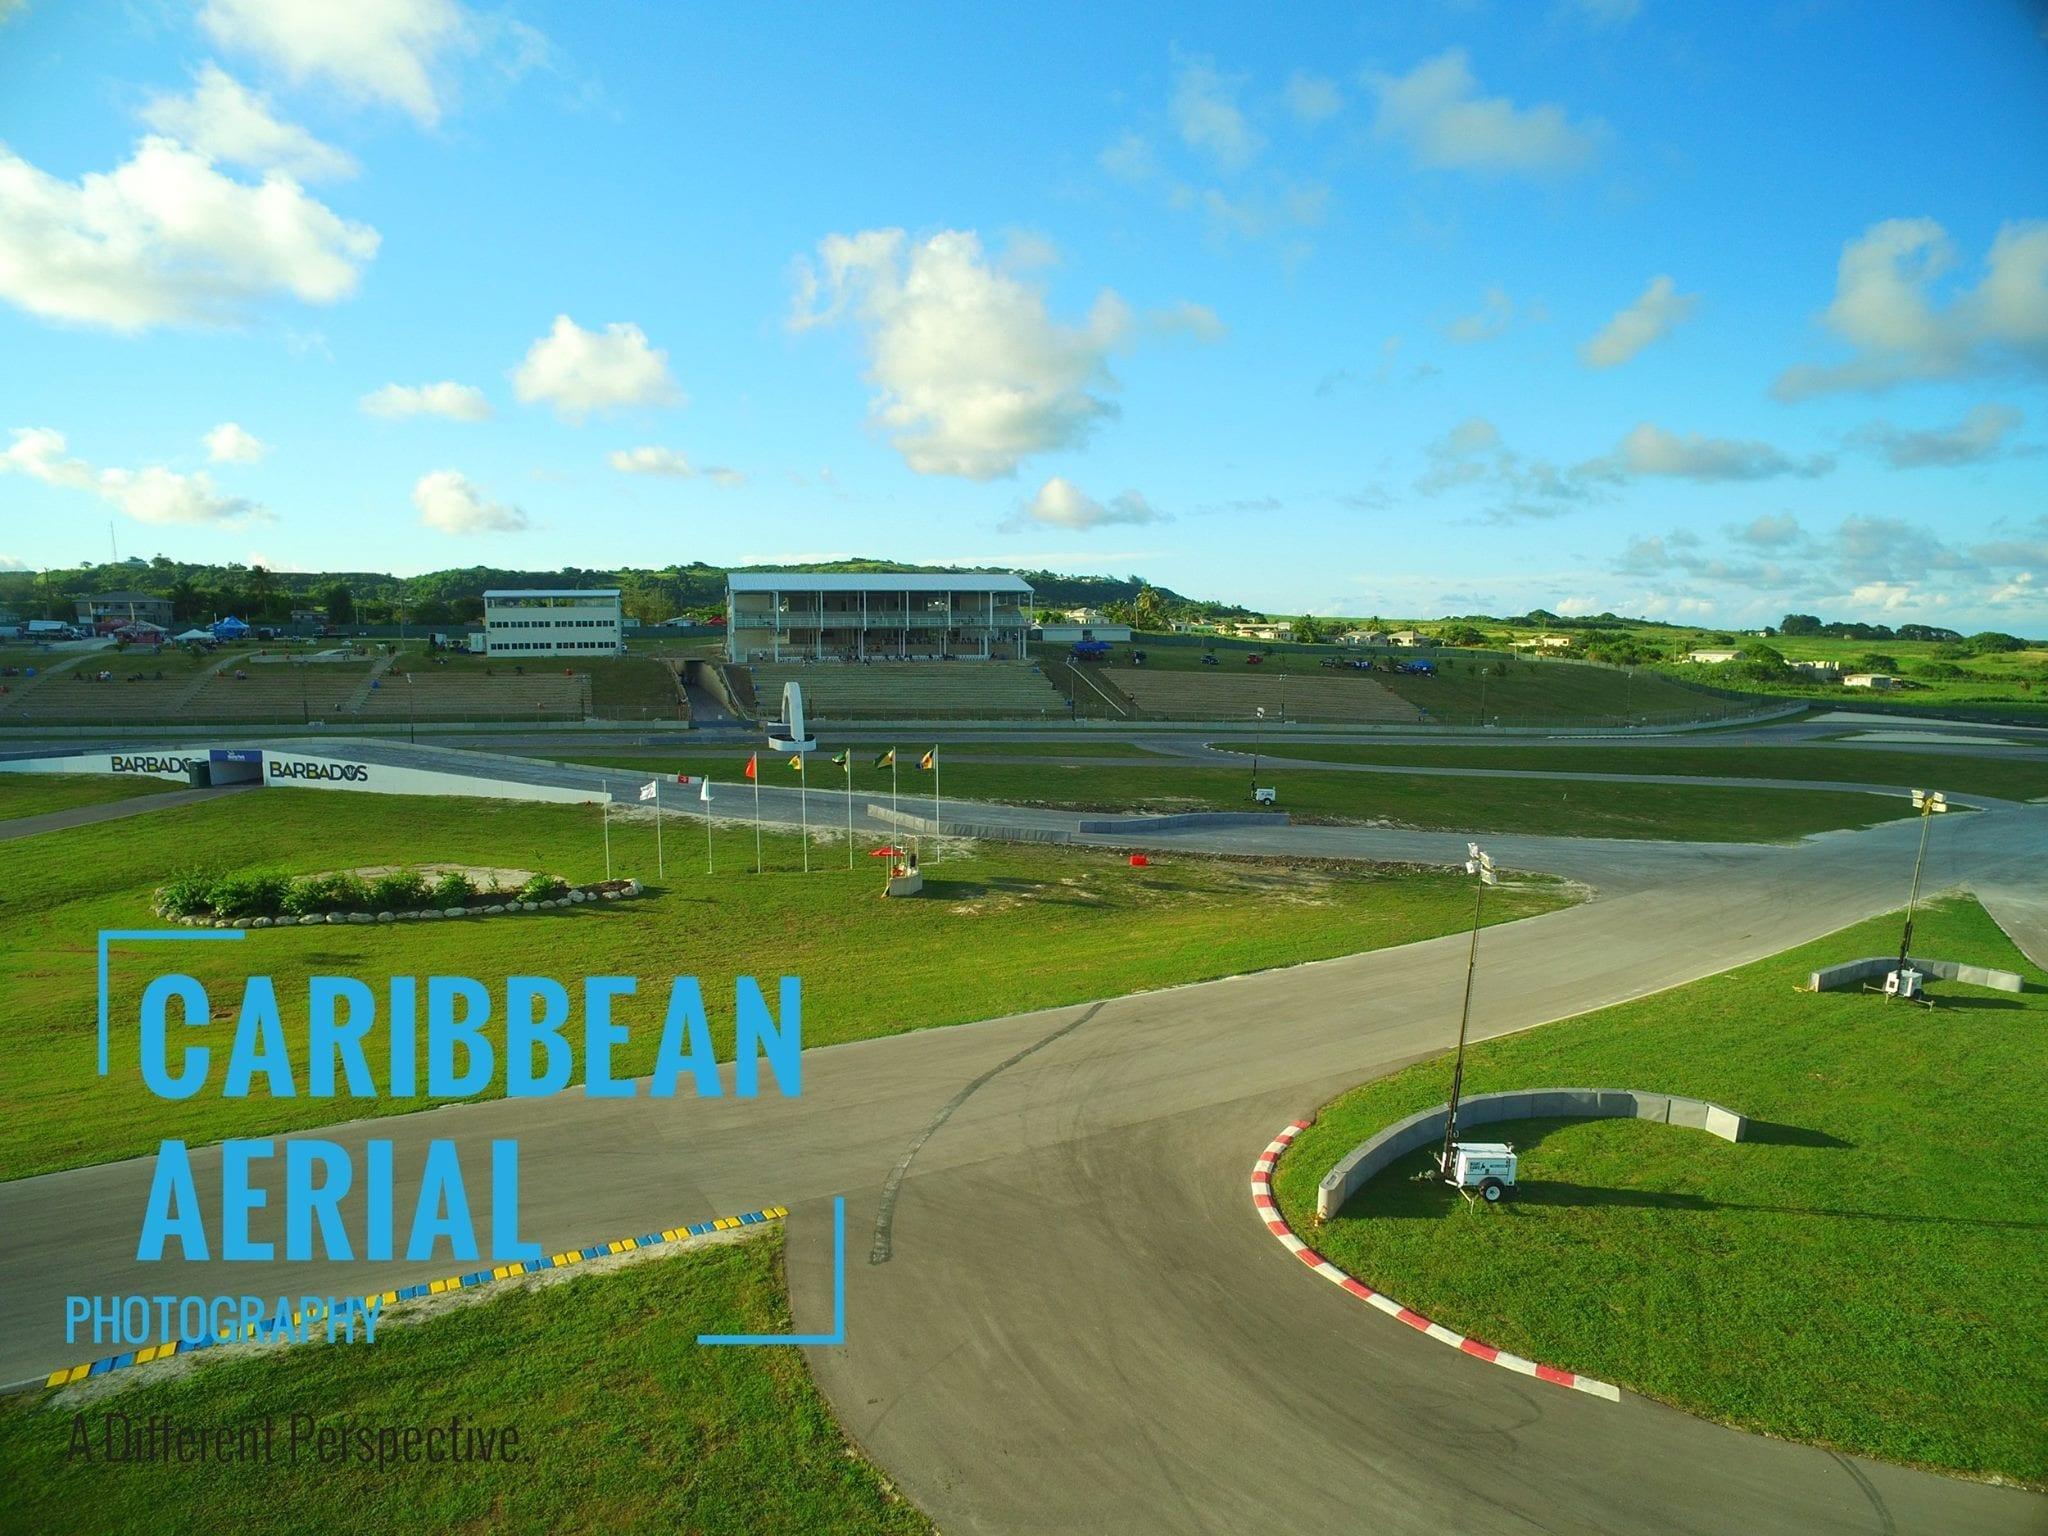 caribbean-aerial-photography-025